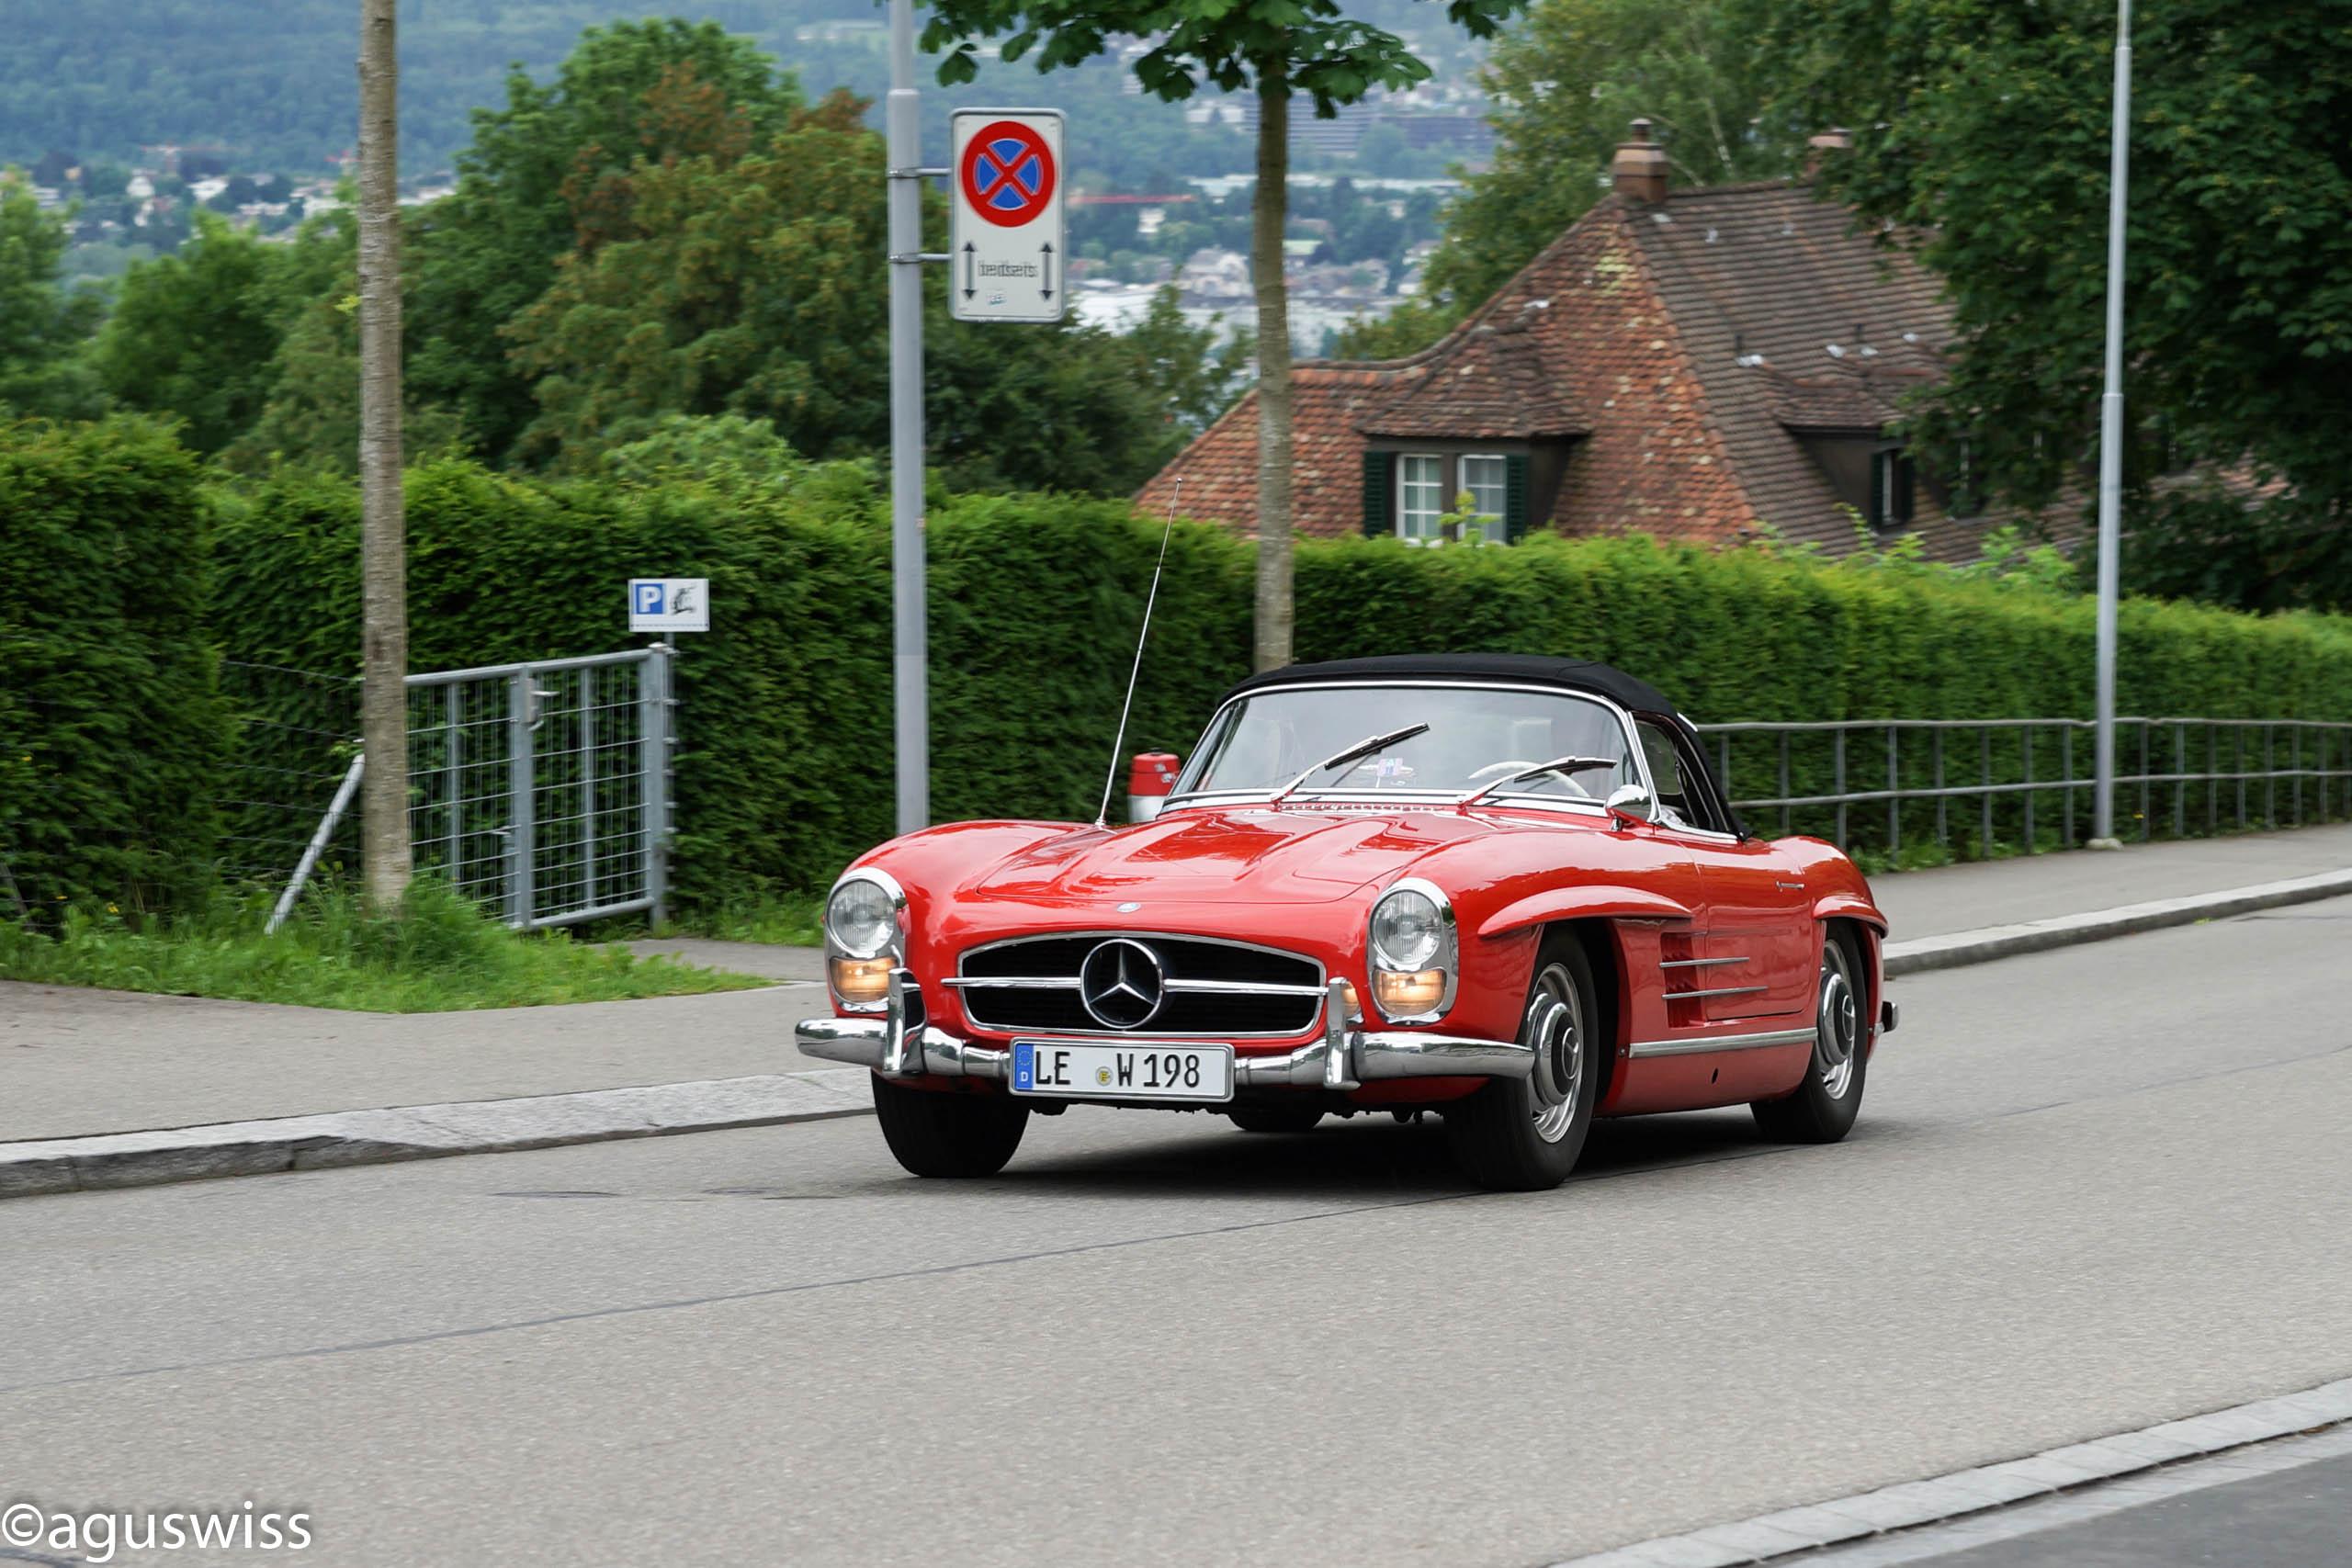 Wallpaper Street Road Mercedes Benz Sports Car Roadster - Sports cars 394